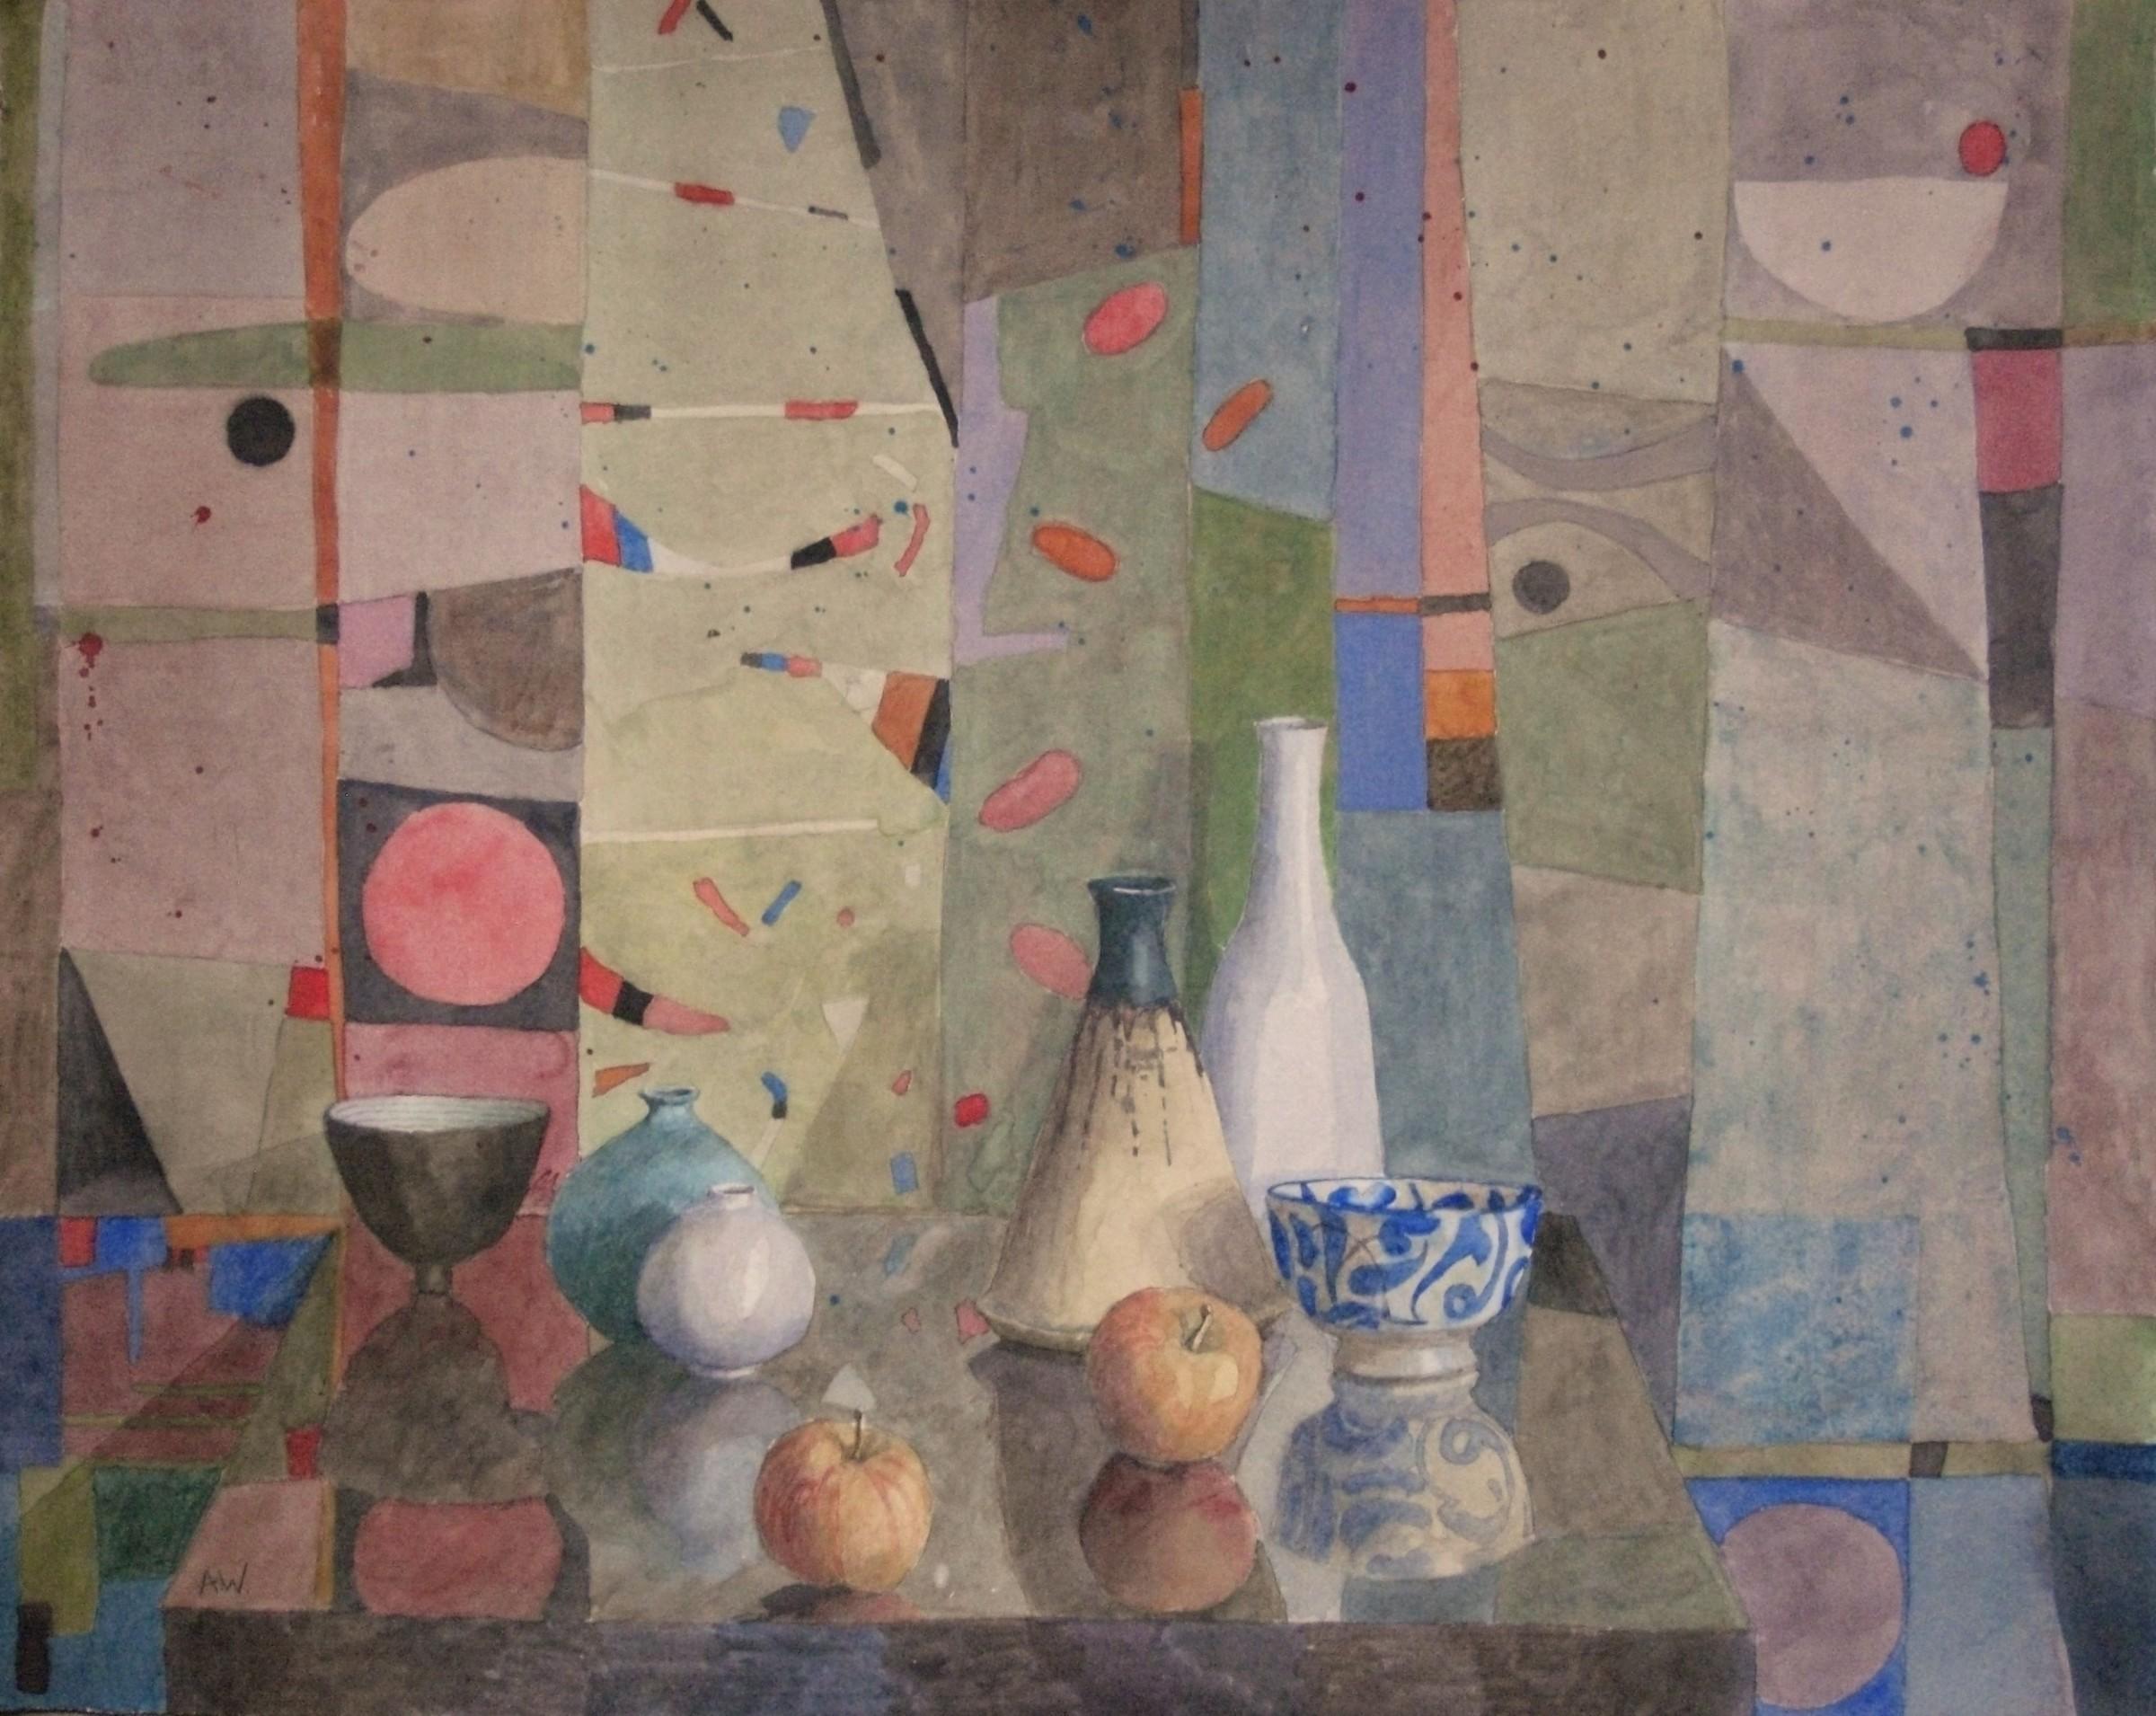 <span class=&#34;link fancybox-details-link&#34;><a href=&#34;/exhibitions/24/works/artworks_standalone10815/&#34;>View Detail Page</a></span><div class=&#34;artist&#34;><span class=&#34;artist&#34;><strong>Annie Williams</strong></span></div><div class=&#34;title&#34;><em>Still Life with Two Apples</em></div><div class=&#34;medium&#34;>watercolour</div><div class=&#34;dimensions&#34;>58x67cm</div>